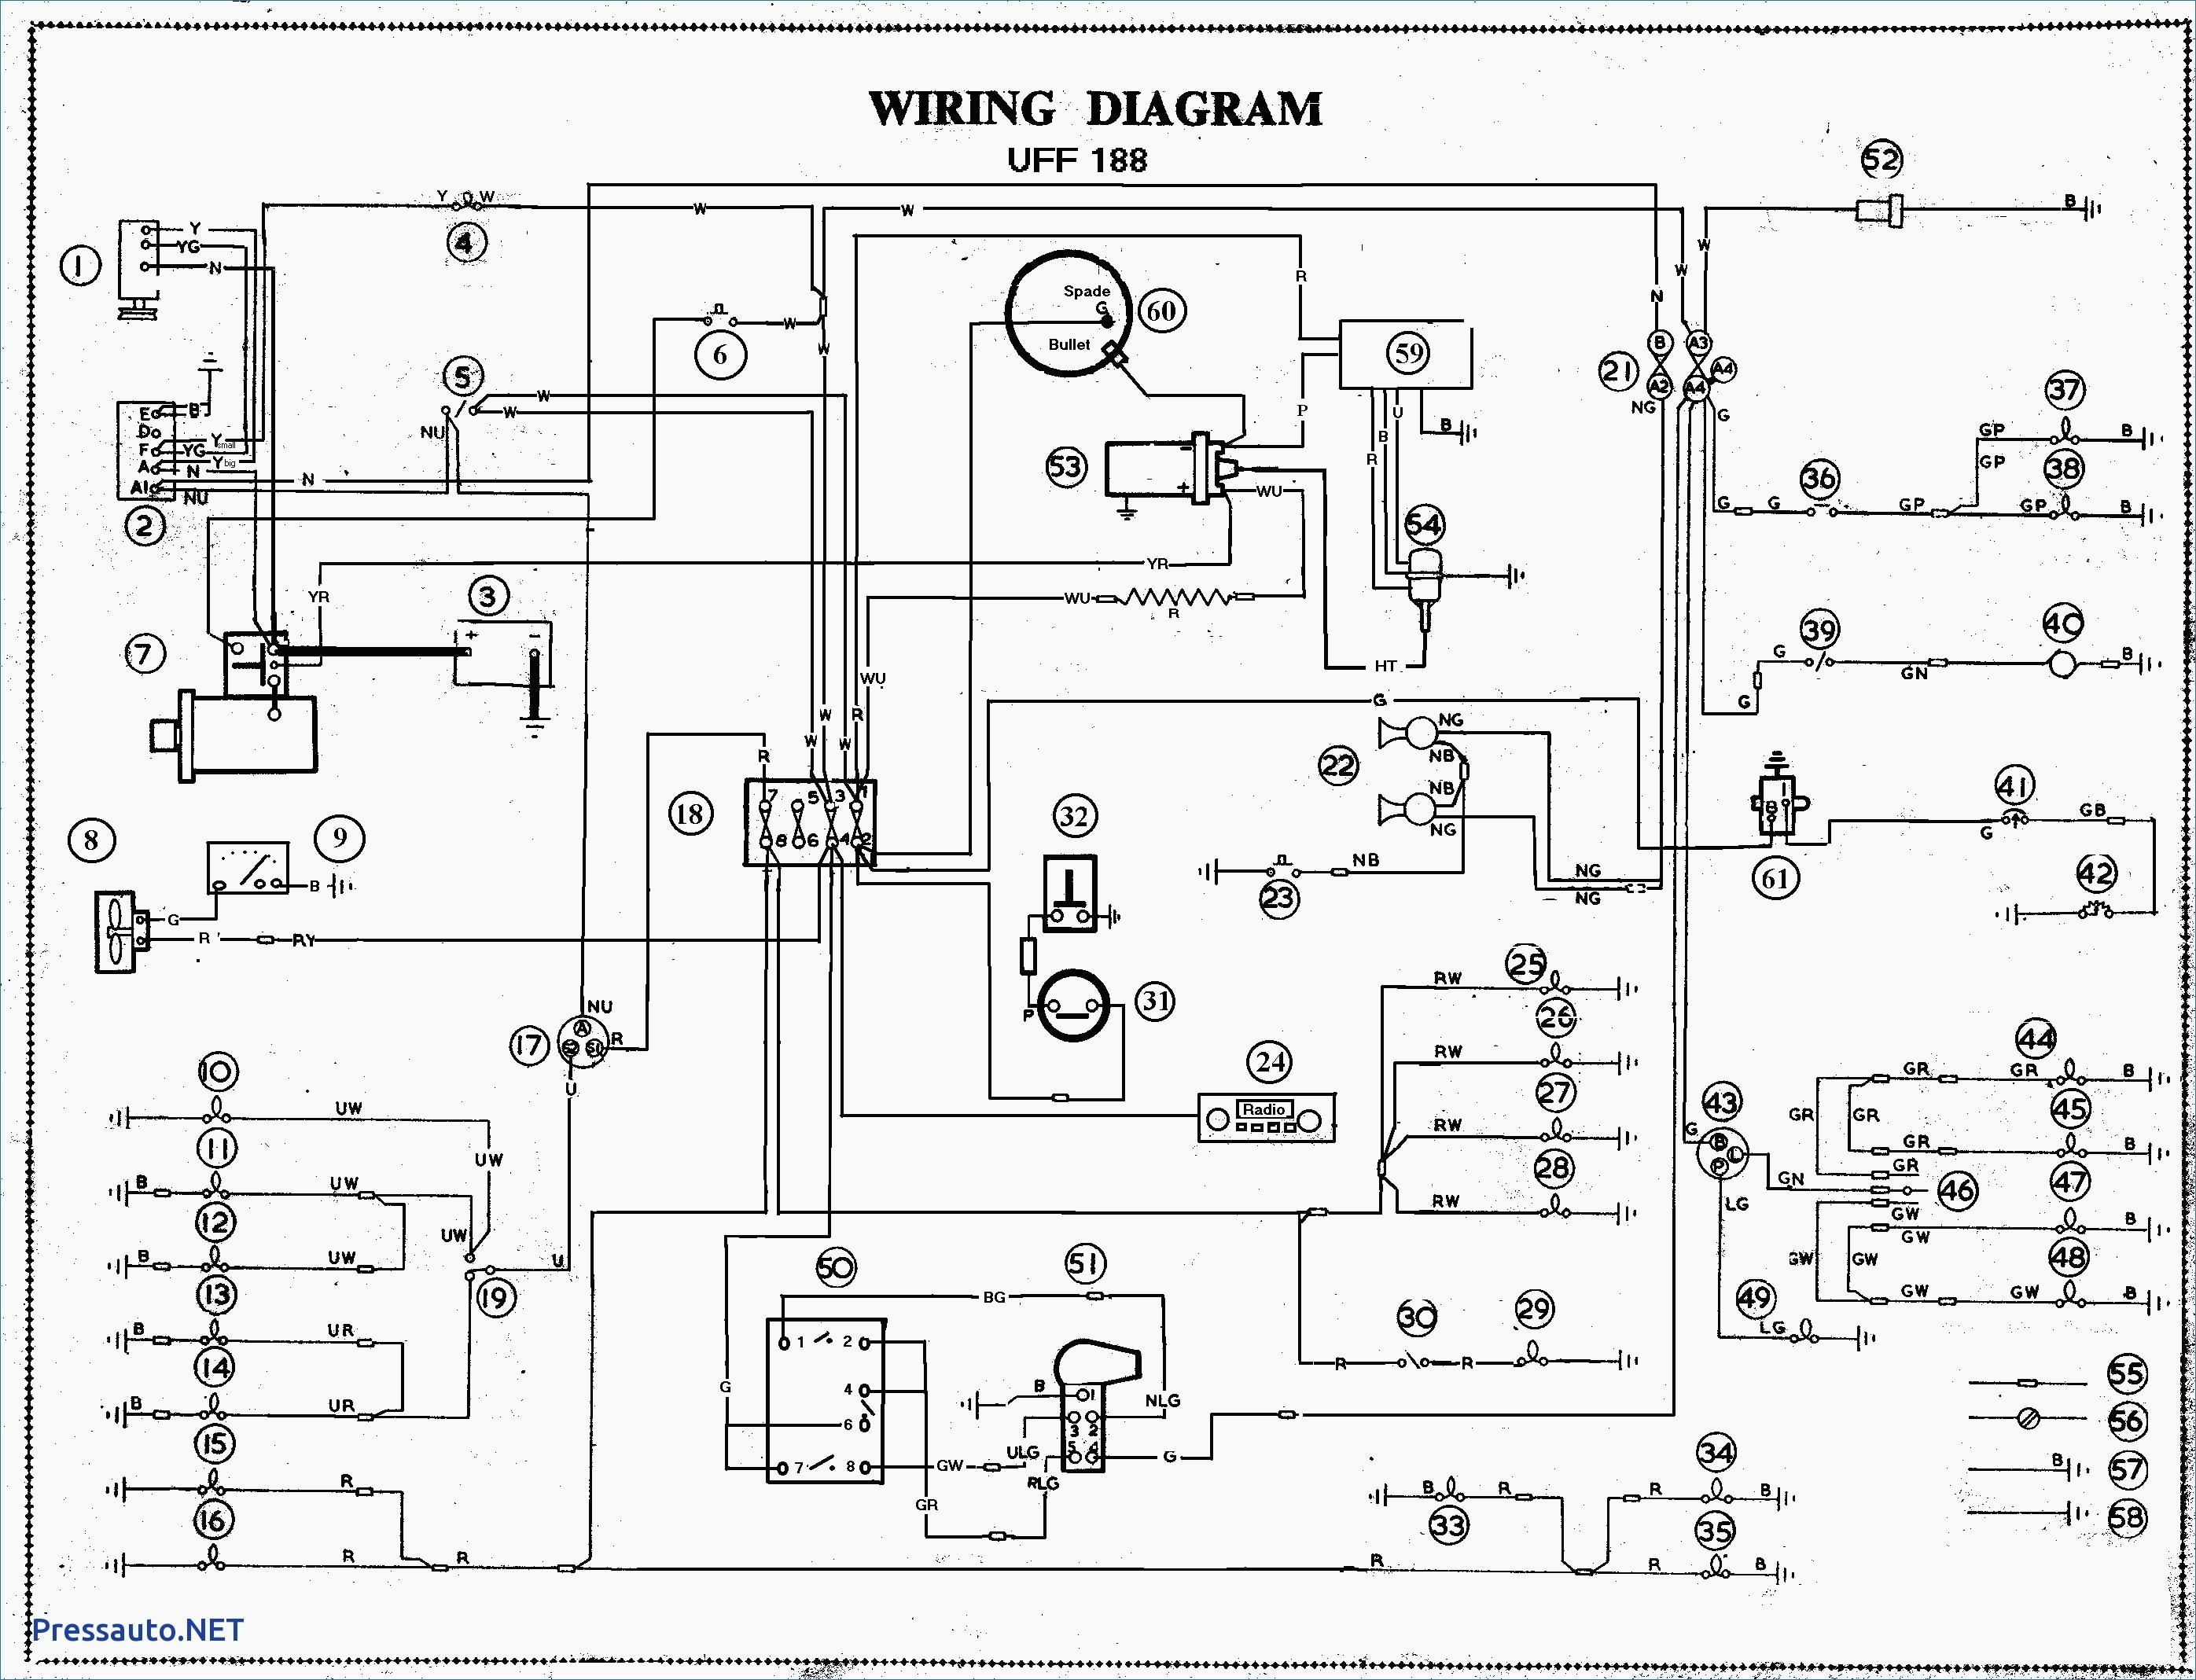 LT_5468] Common Automotive Wiring Diagram Symbols Diagrams For Car RepairsHabi Inrebe Mohammedshrine Librar Wiring 101